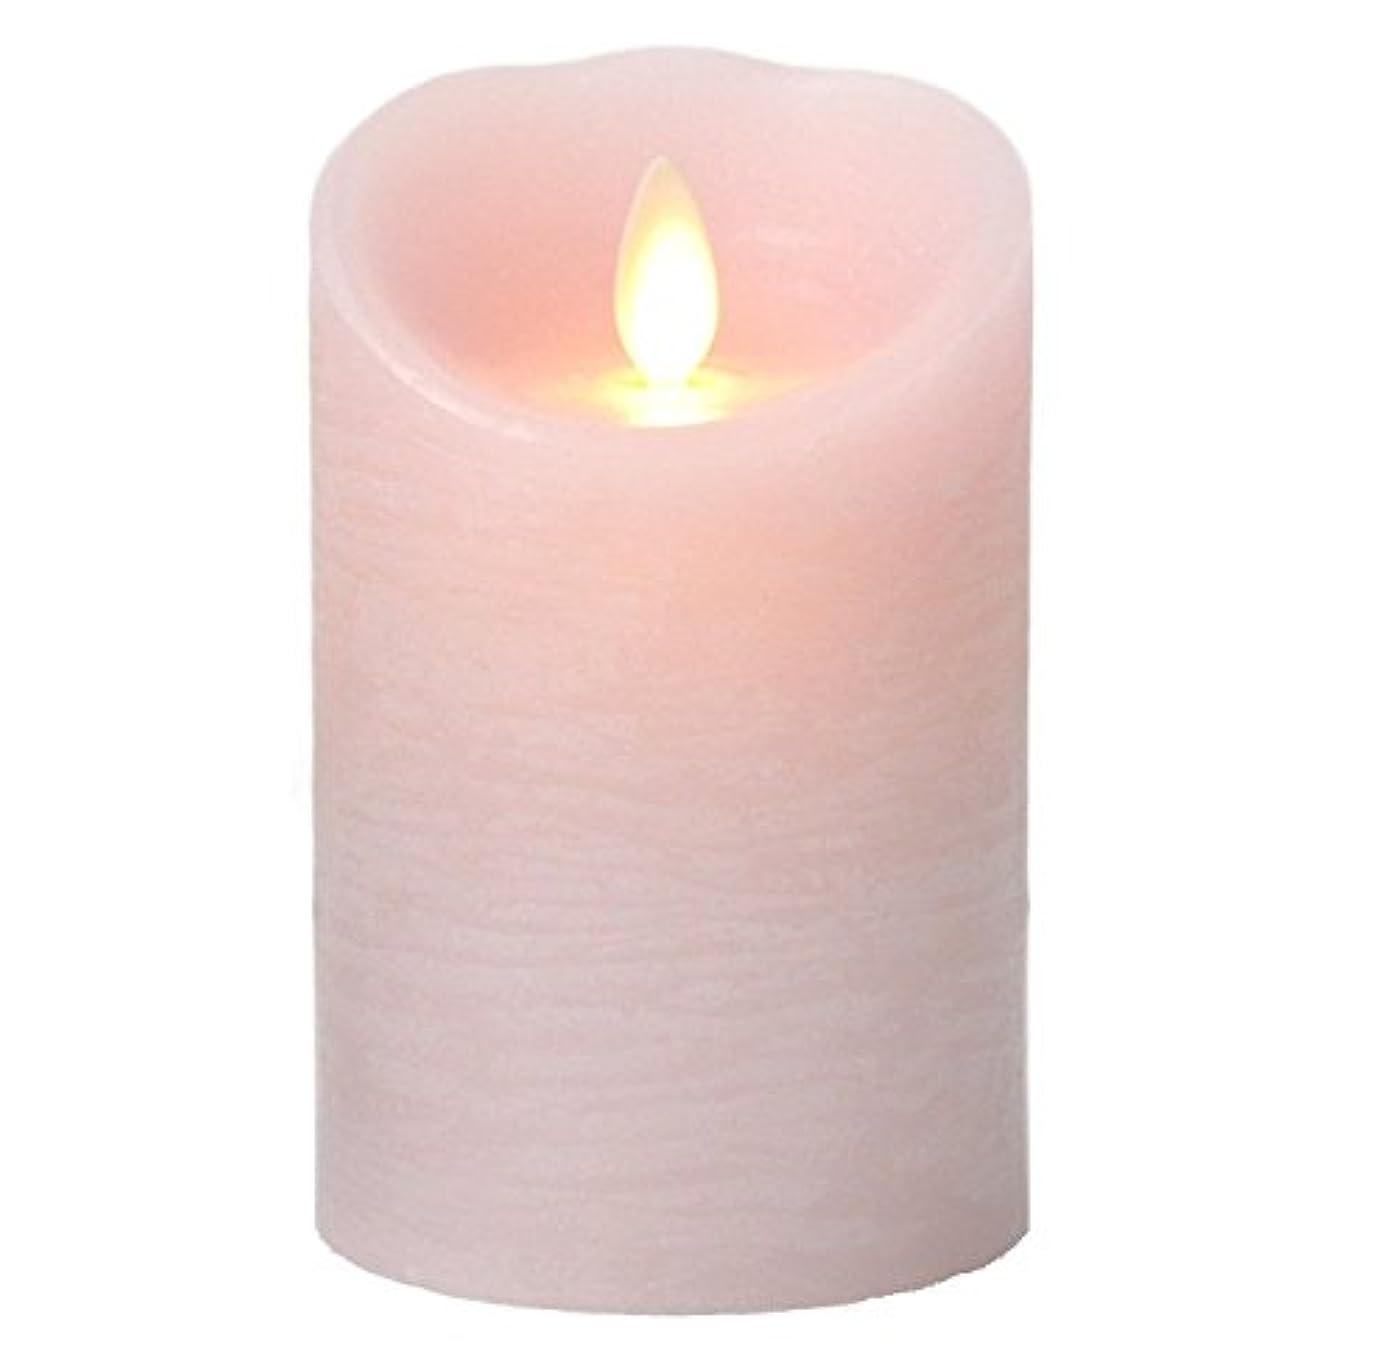 LUMINARA(ルミナラ)ピラー3×4【ギフトボックス付き】 「 ピンク 」 03070010BPK